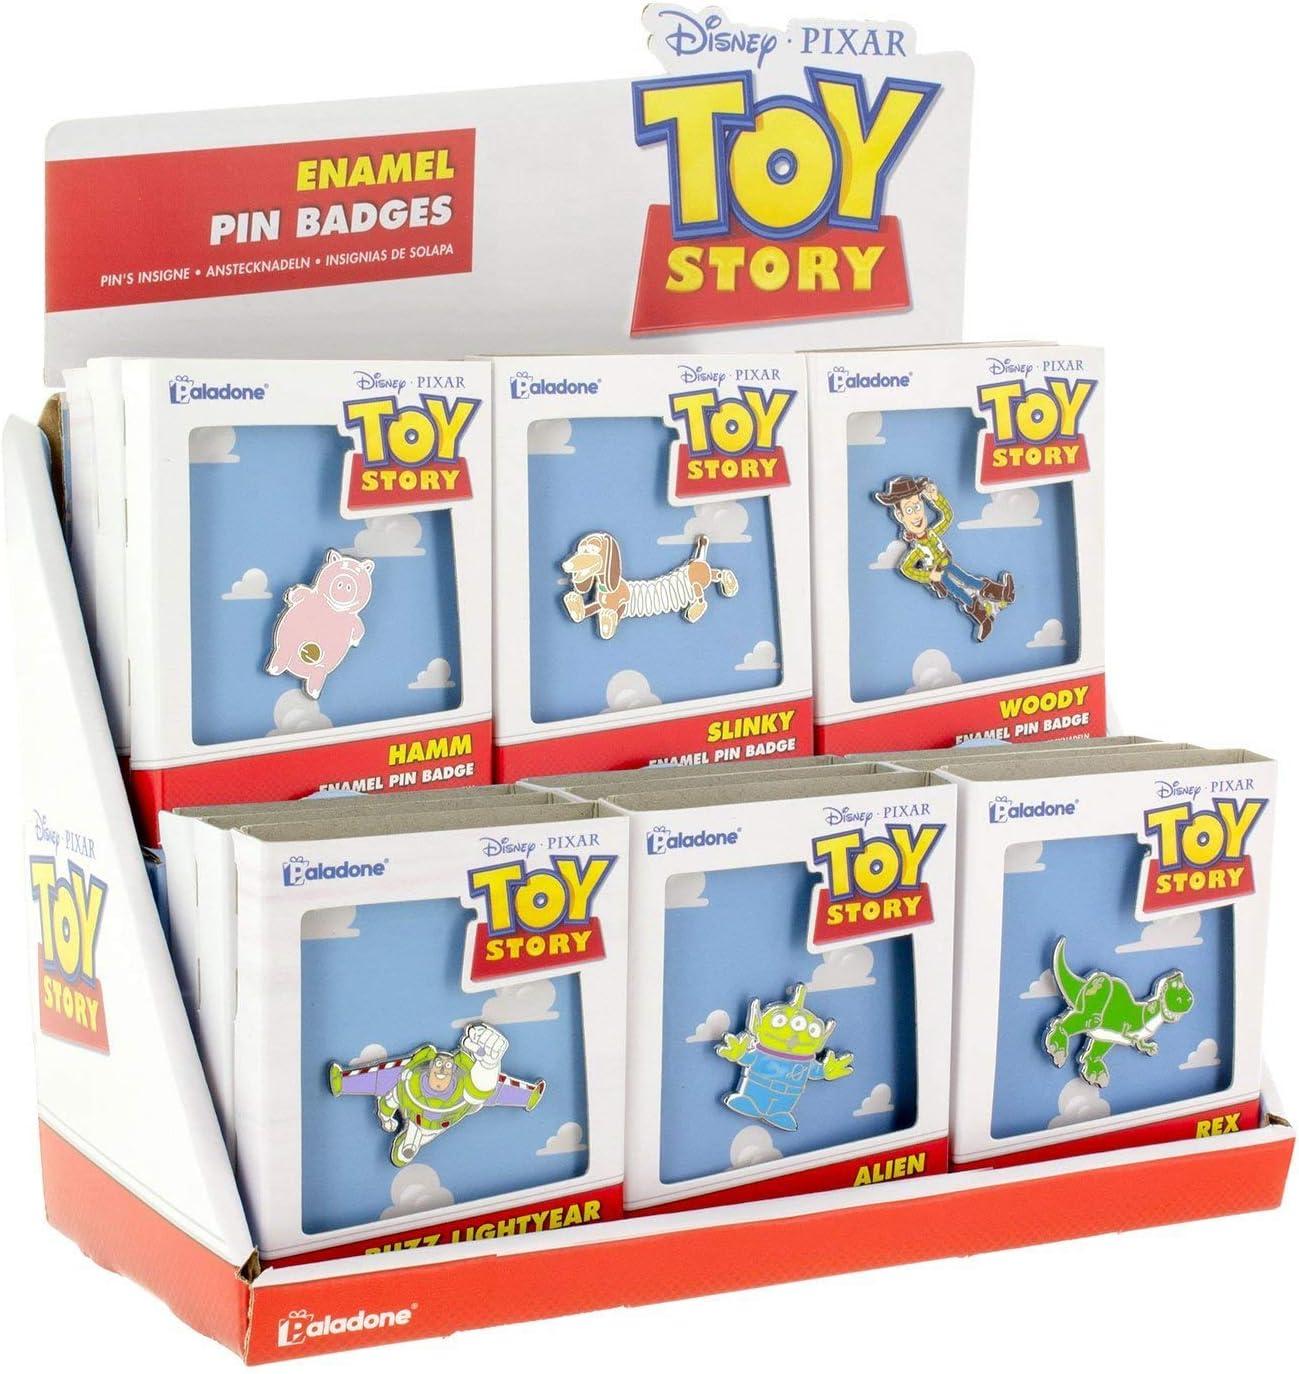 Lucky Dip from 6 Versions Hamm Slinky Woody Buzz Lightyear Alien Or Rex Brooch Toy Story Enamel Pin Badges